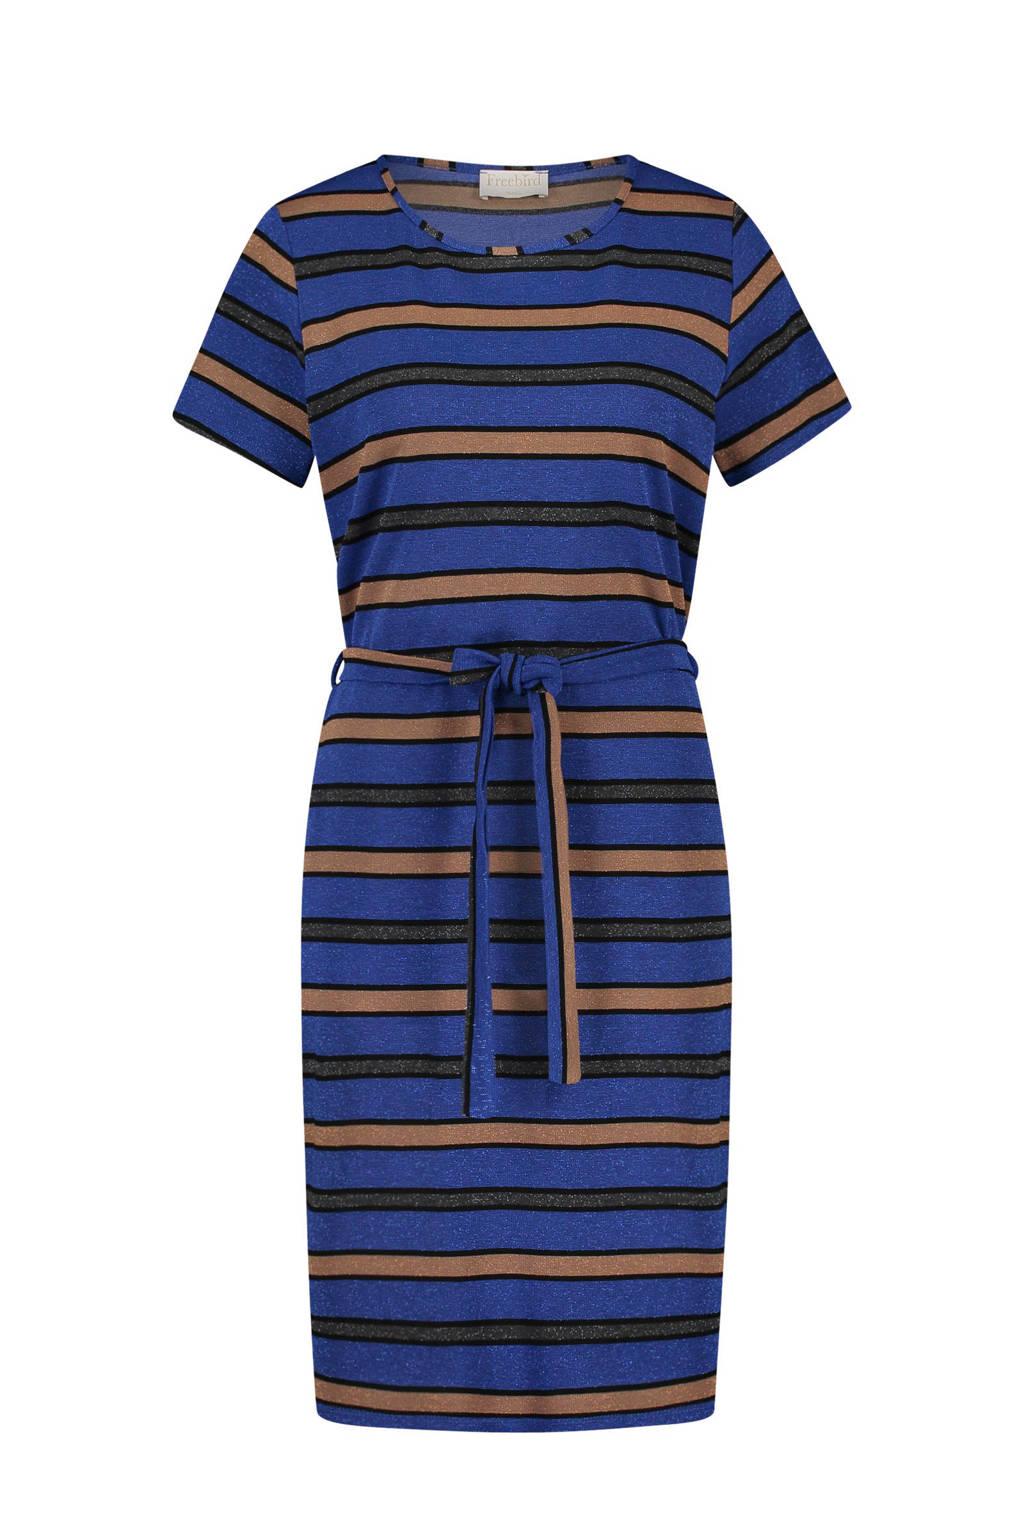 Freebird T-shirt jurk met streep dessin, Blauw/beige/zwart